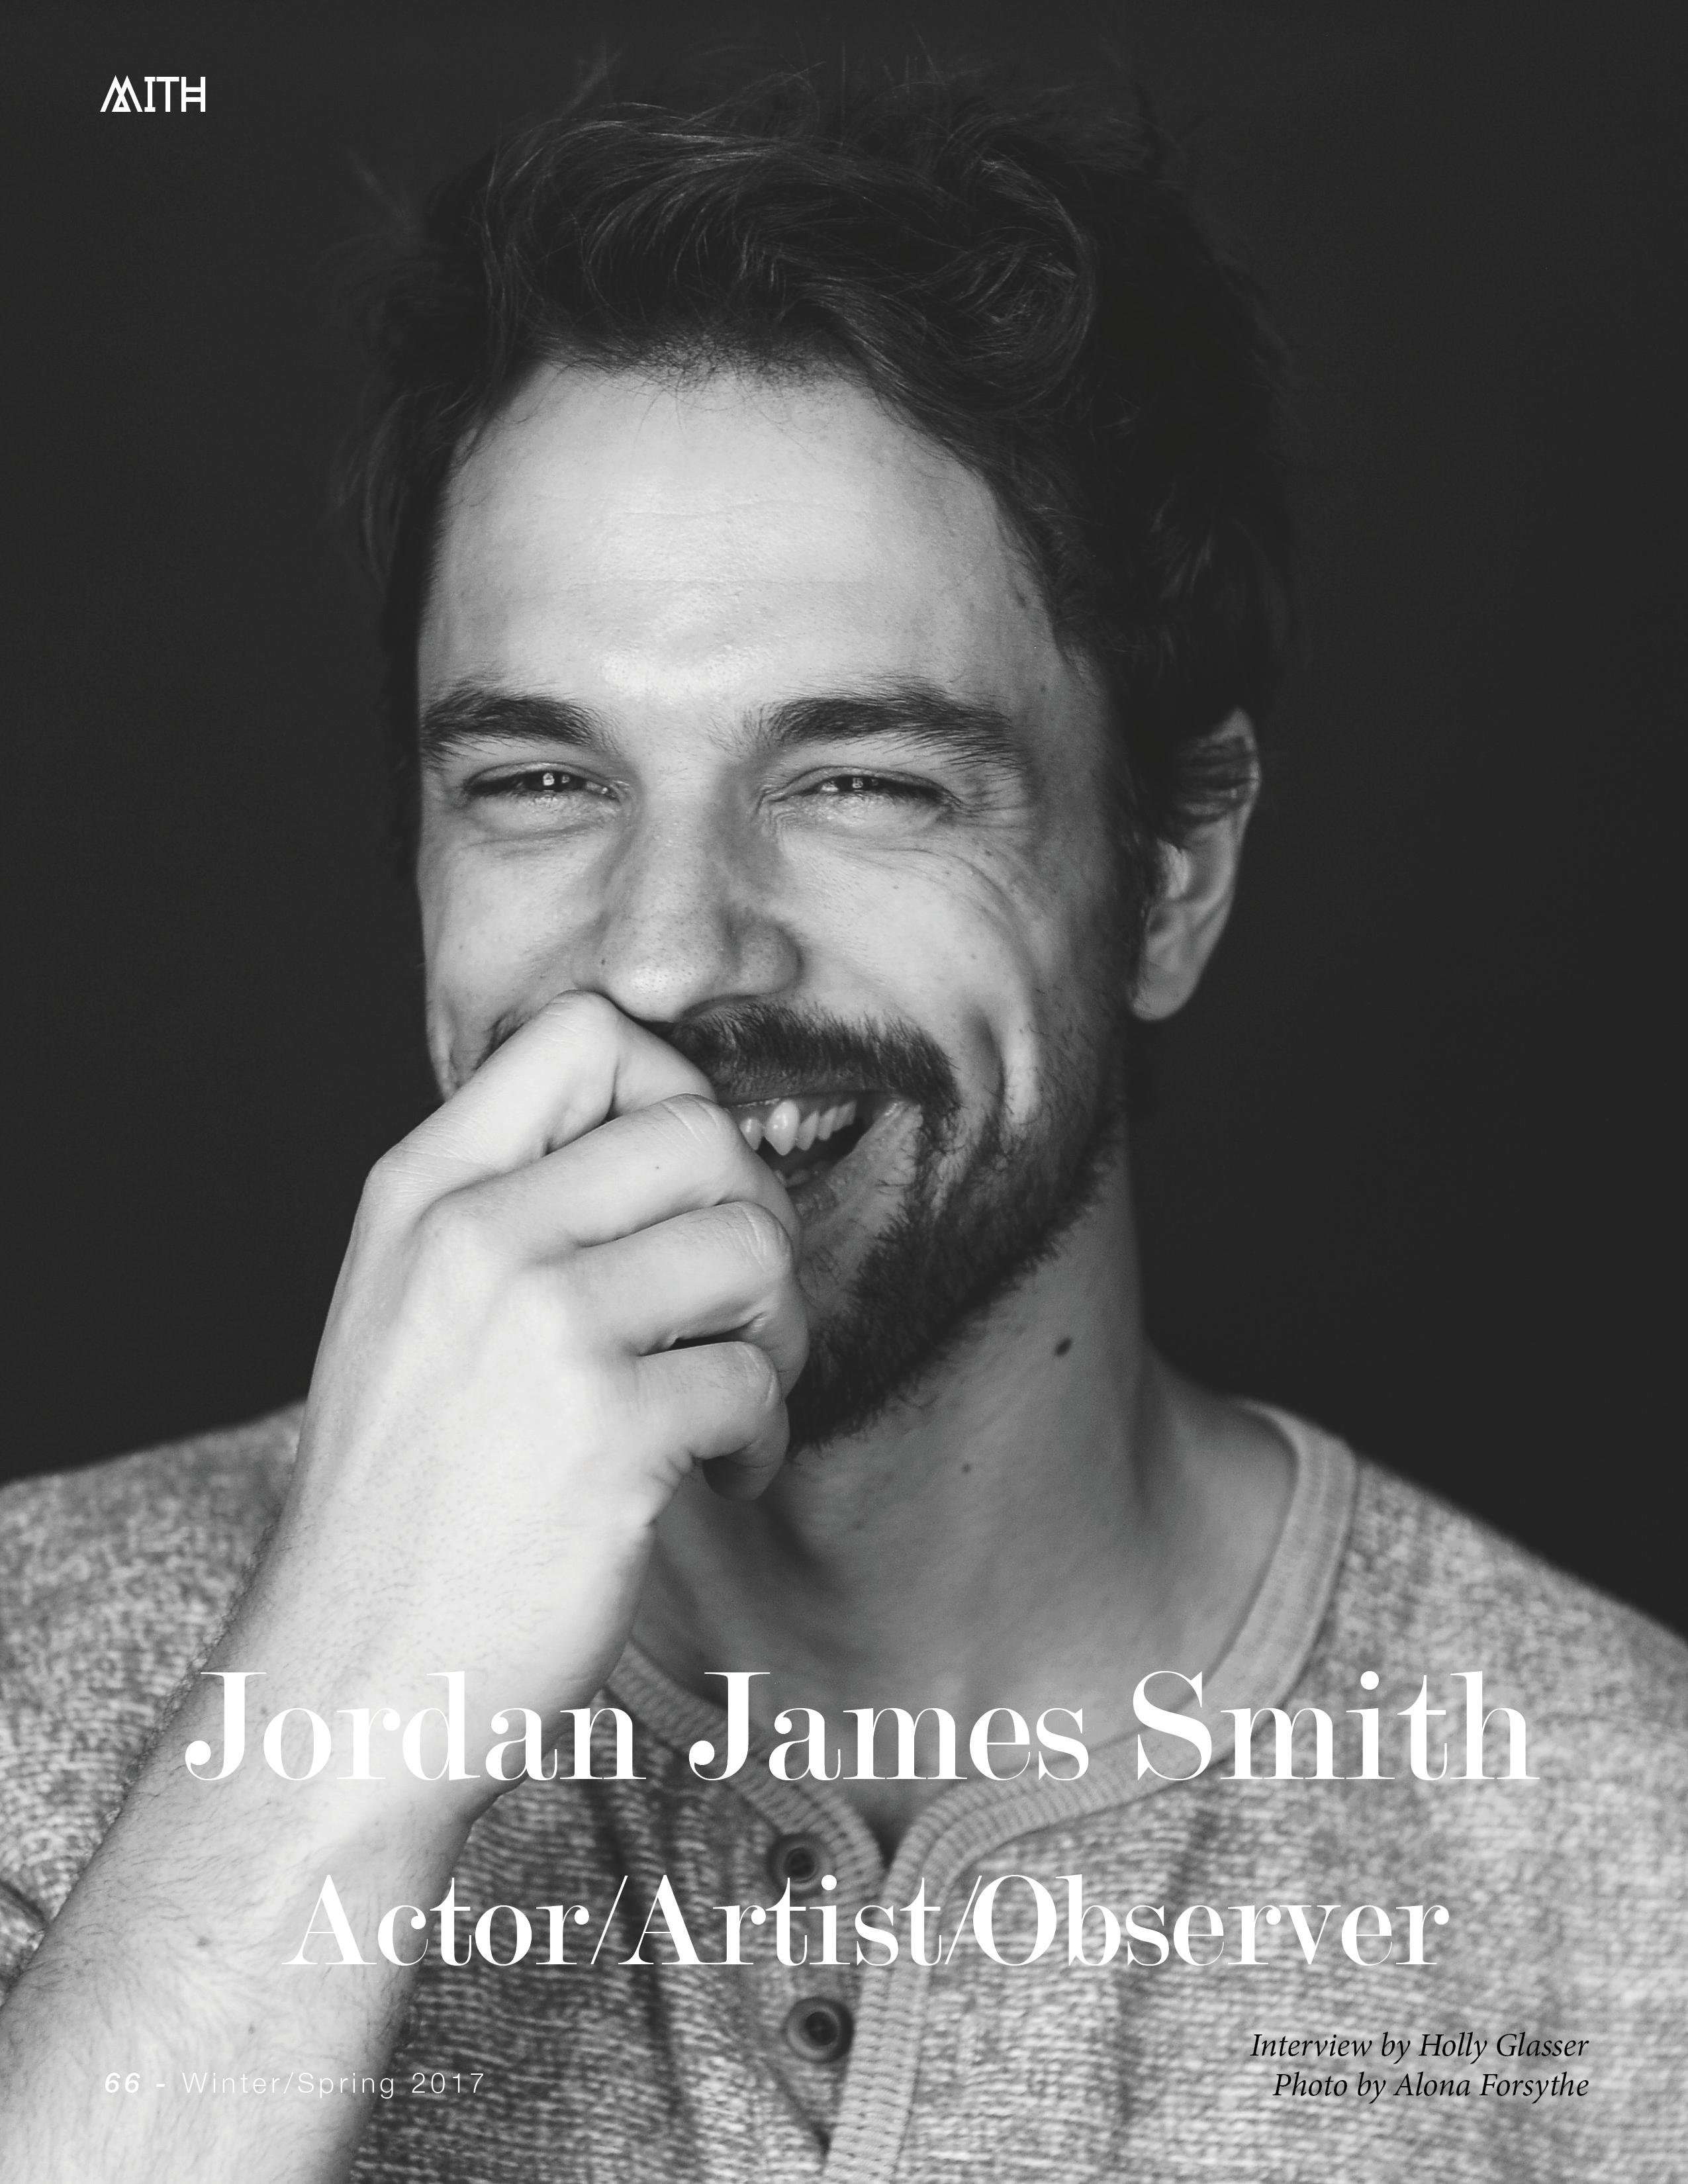 Jordan James Smith :: Actor/Artist/Observer | MITH Magazine